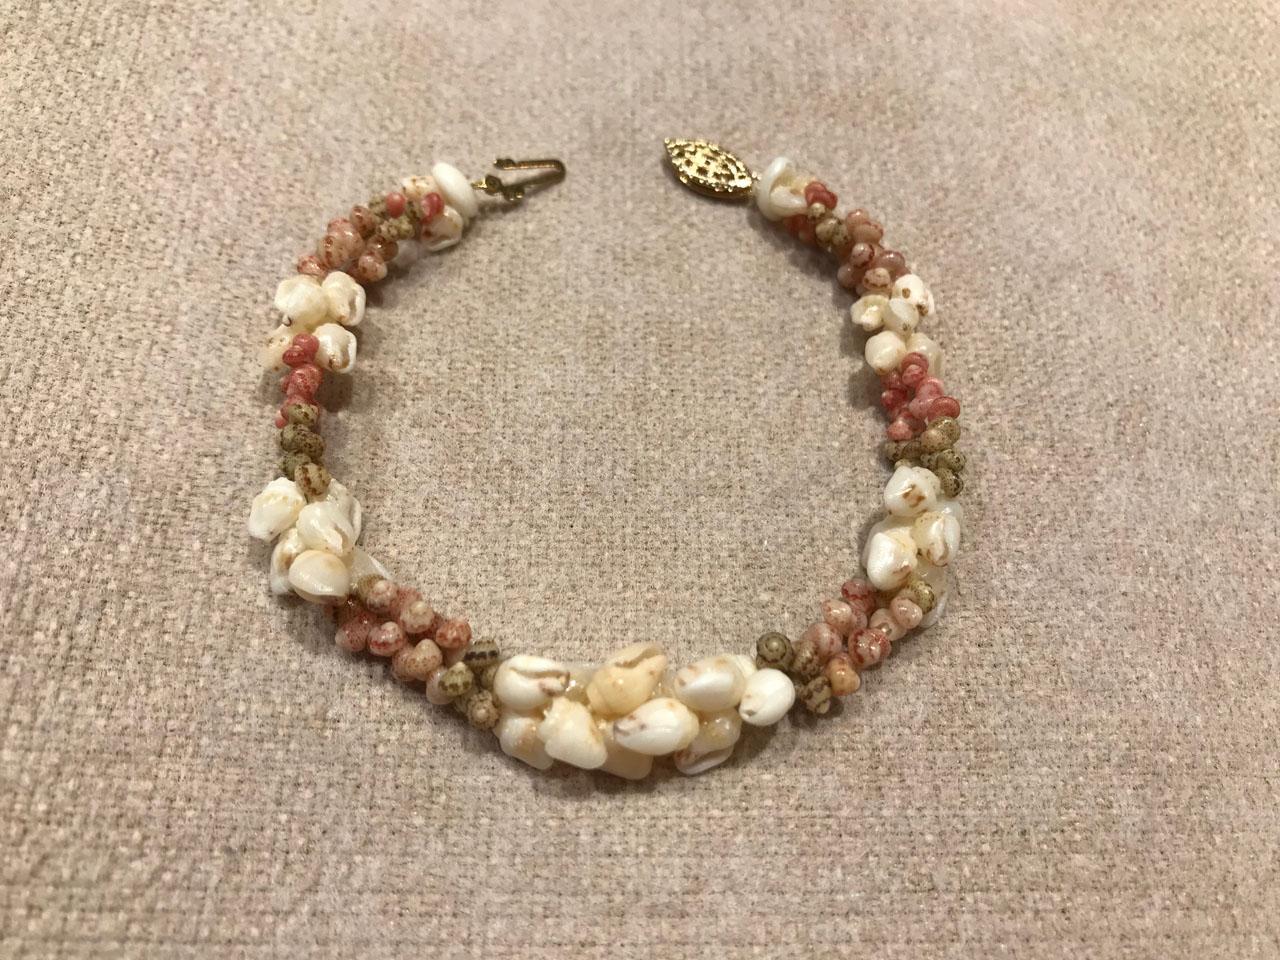 Niʻihau Bracelets